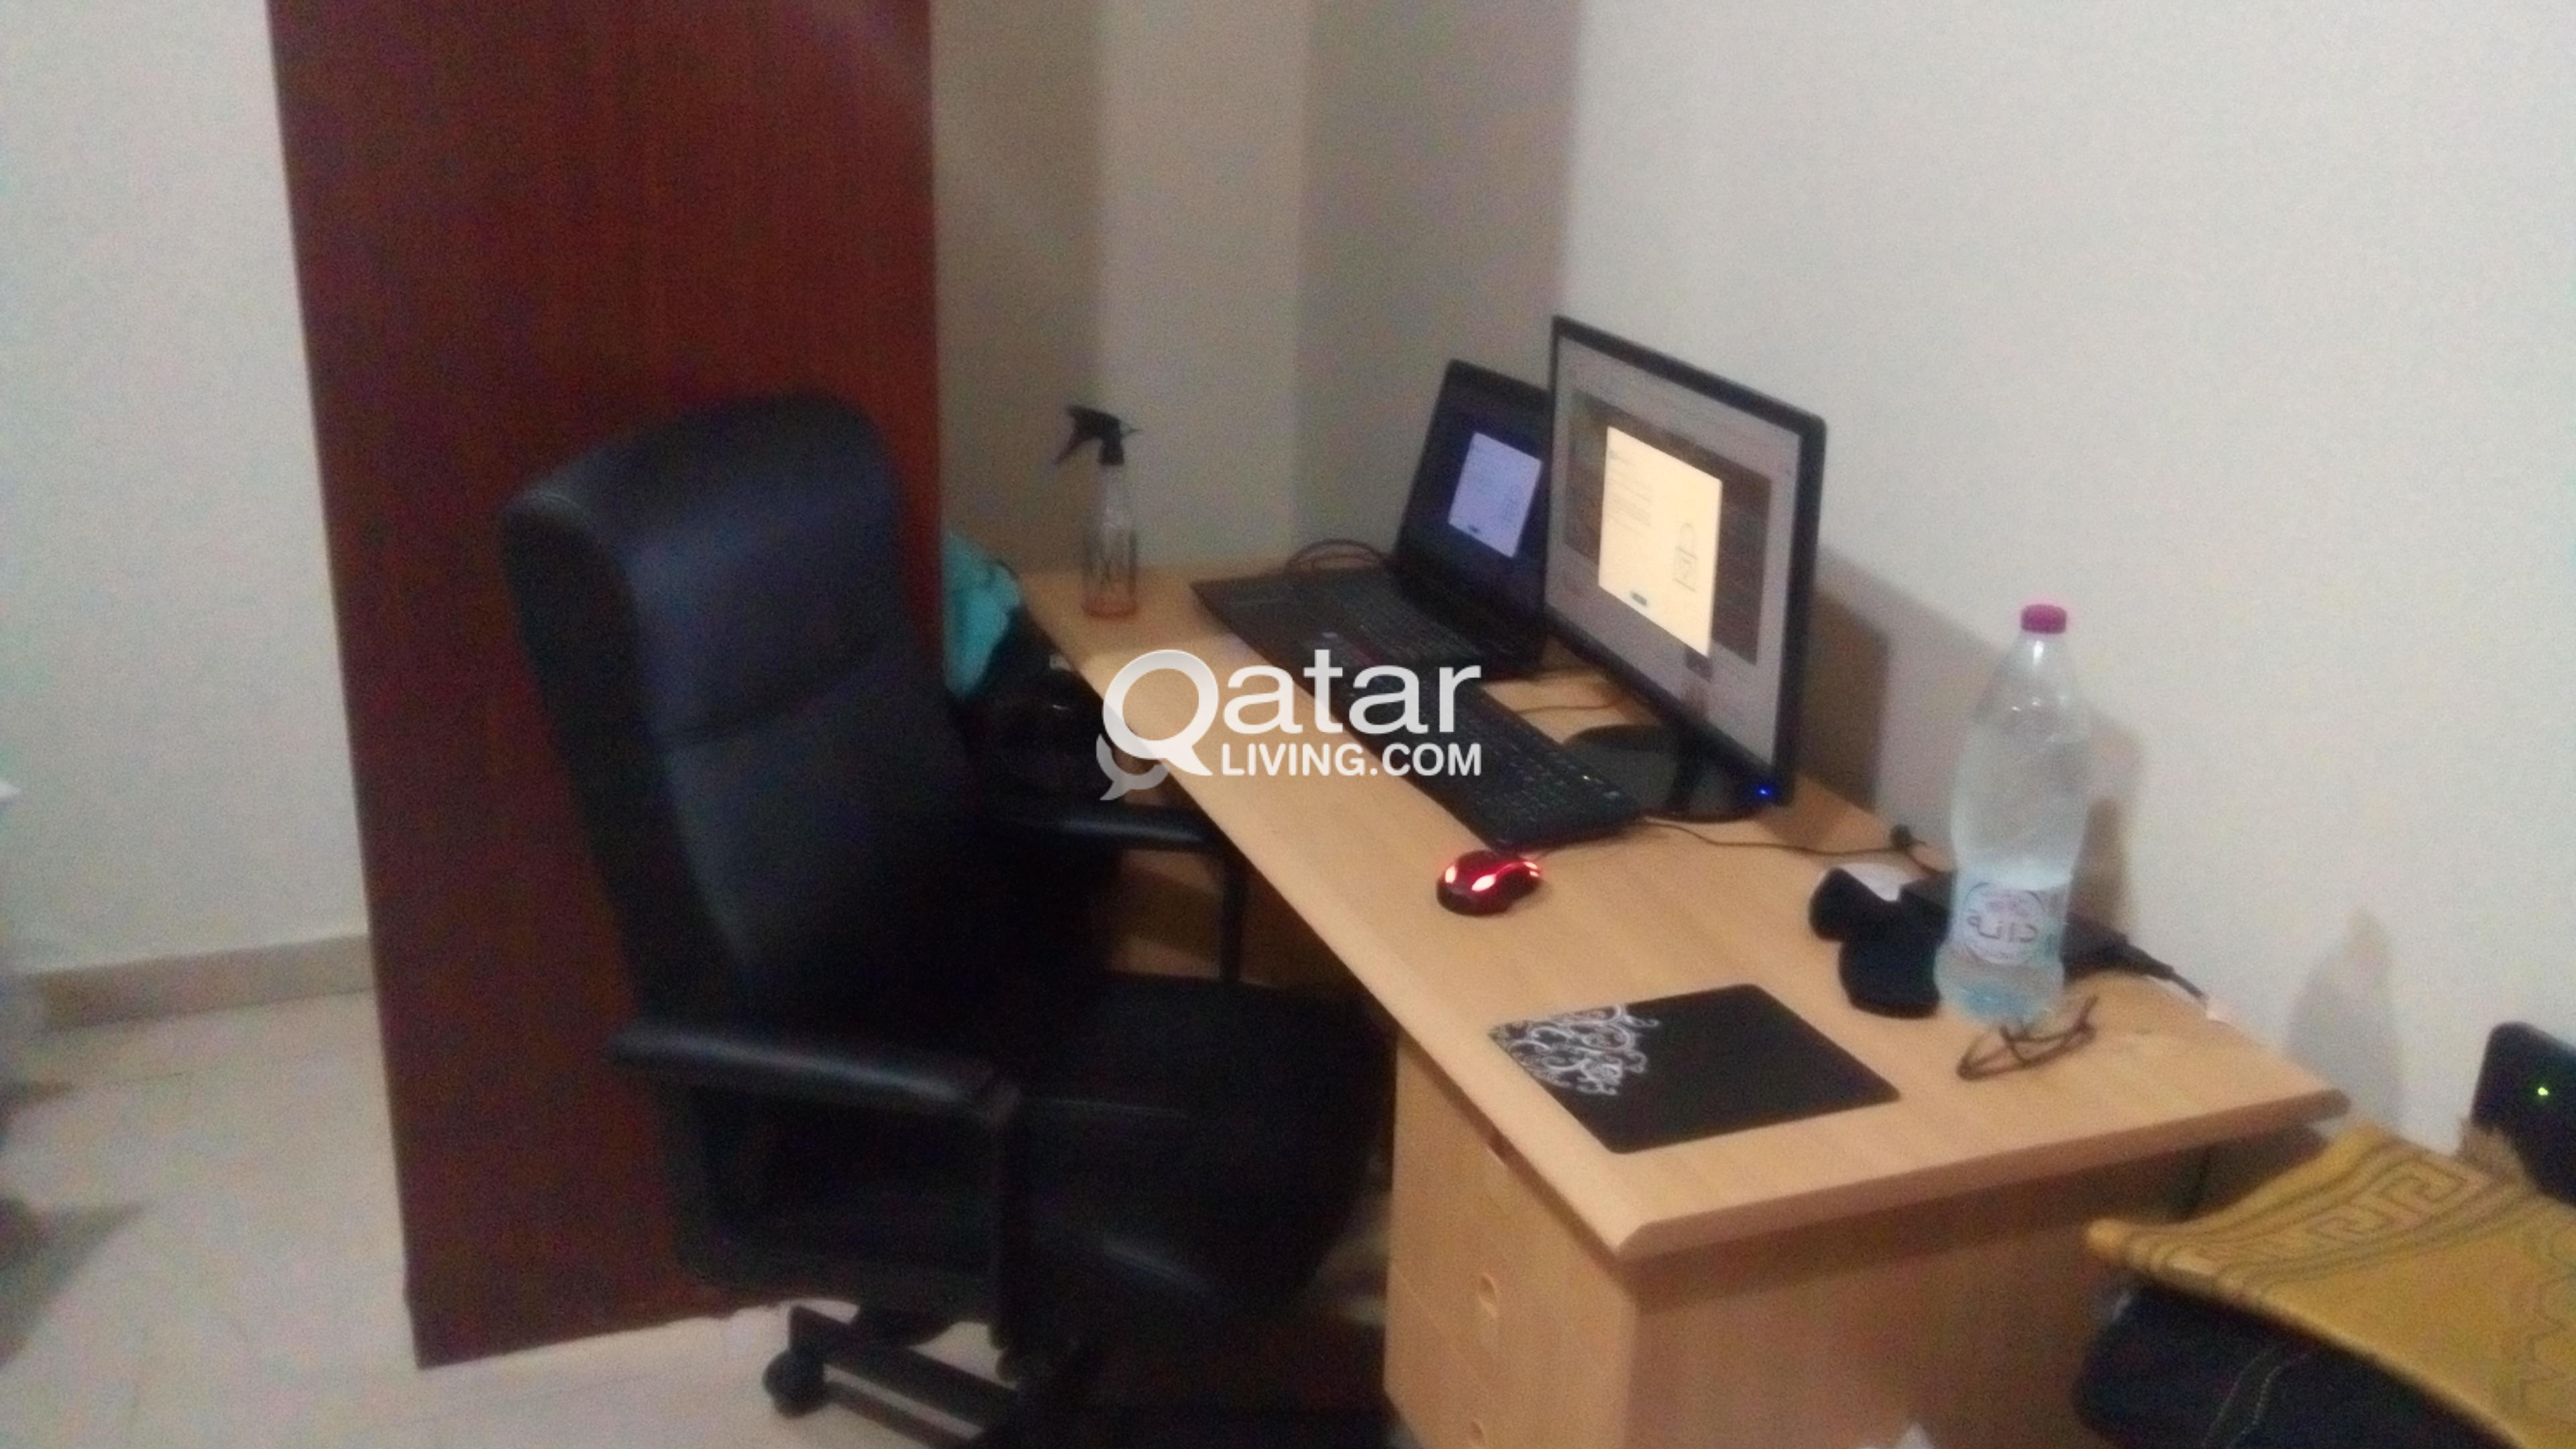 battlestation luxury img home computer desk desks bestgamesetups of ikea fice